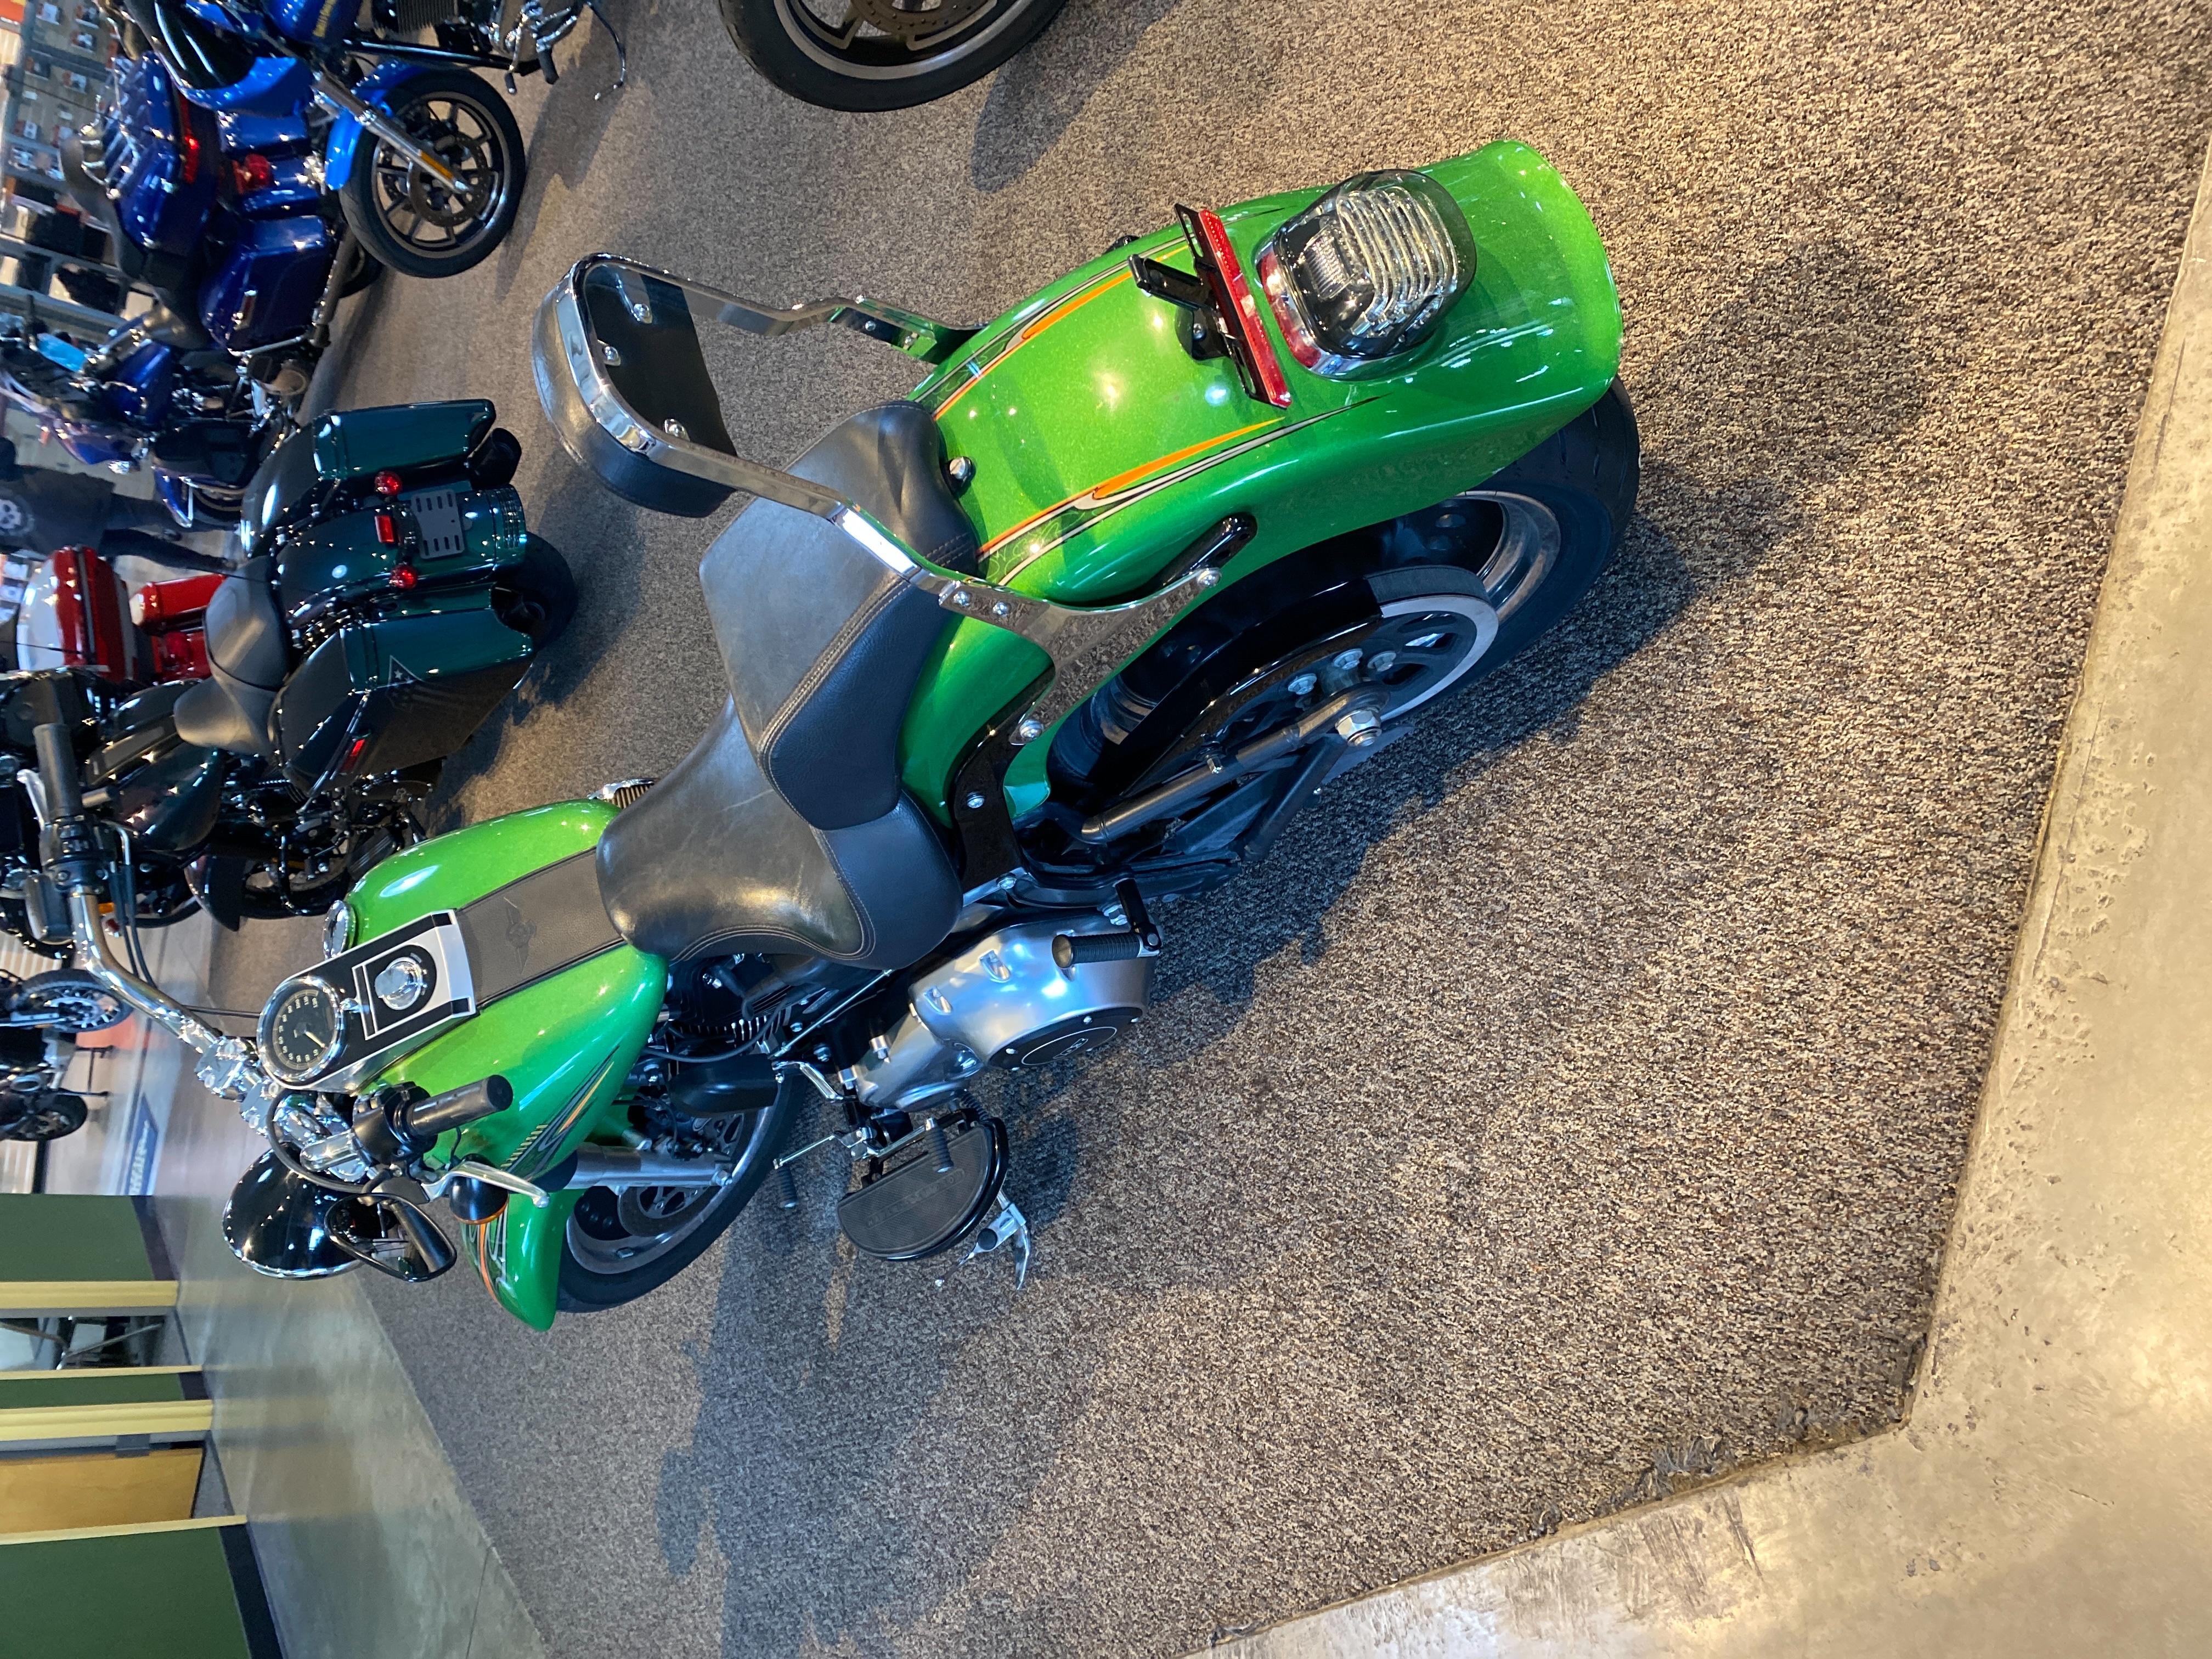 2015 Harley-Davidson Softail Fat Boy Lo at Outpost Harley-Davidson